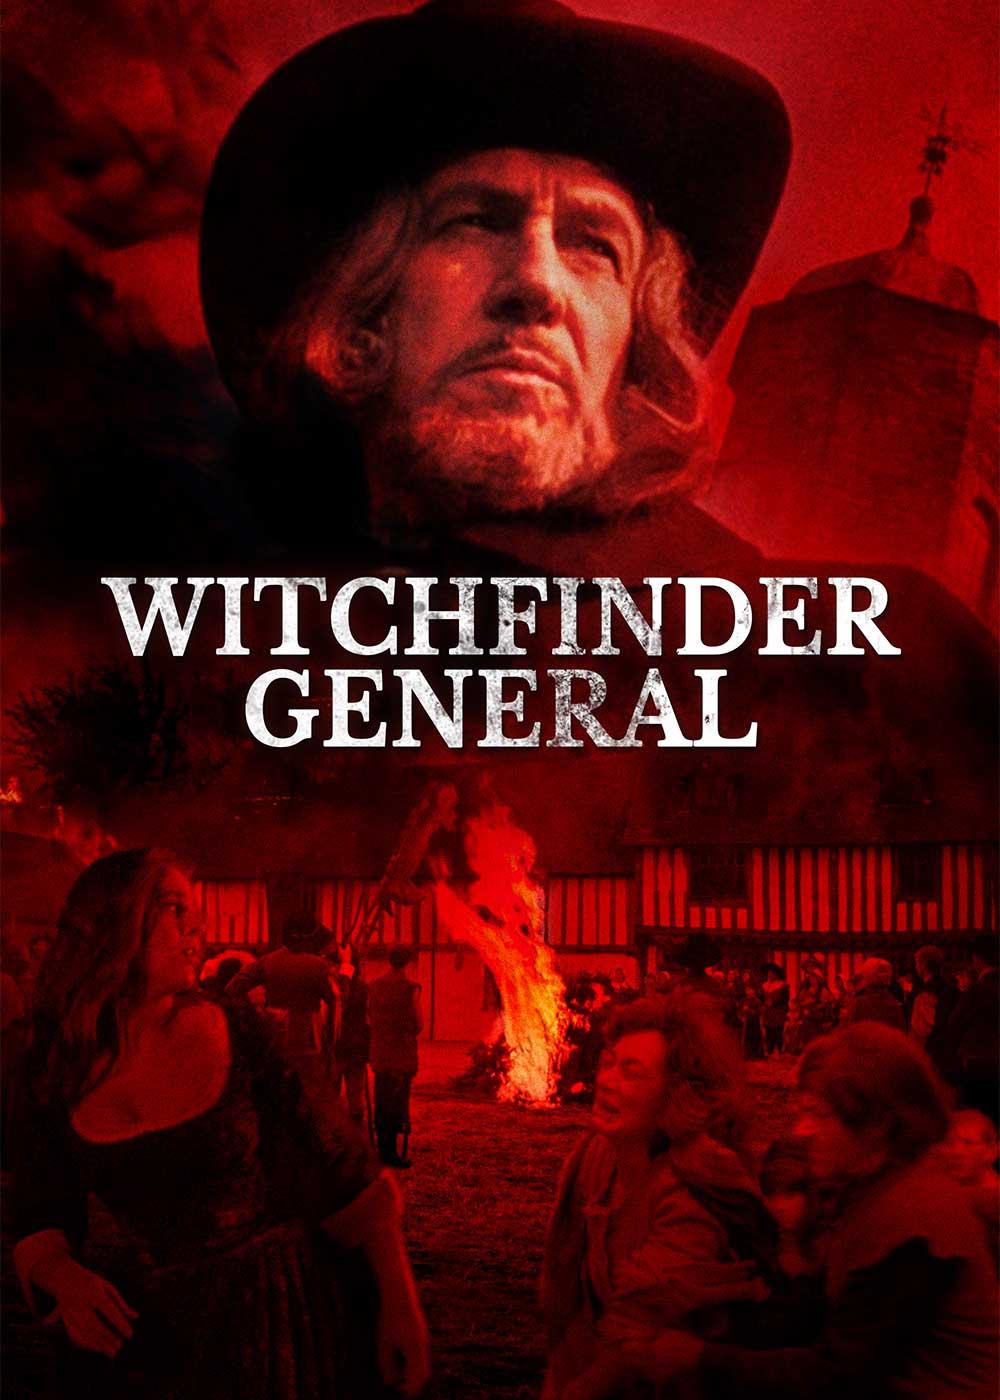 Witchfinder-General_poster.jpg